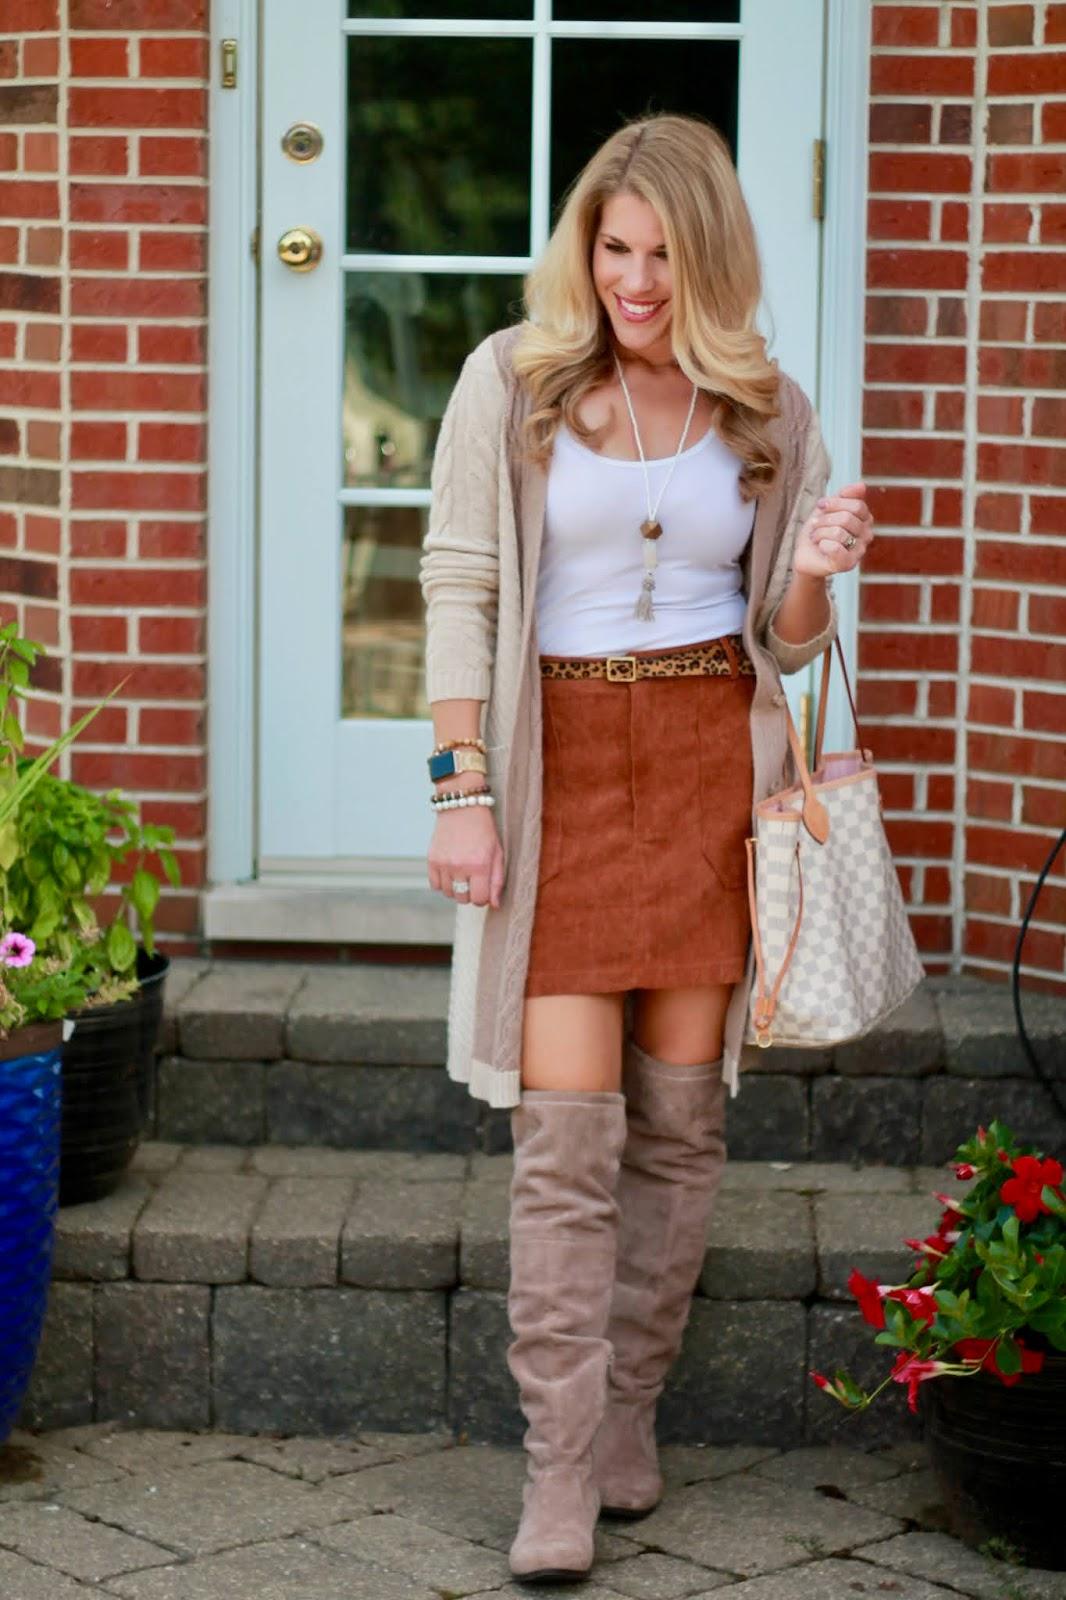 burnt orange corduroy mini skirt, leopard belt, tan cable knit cardigan, OTK taupe boots, LV neverfull